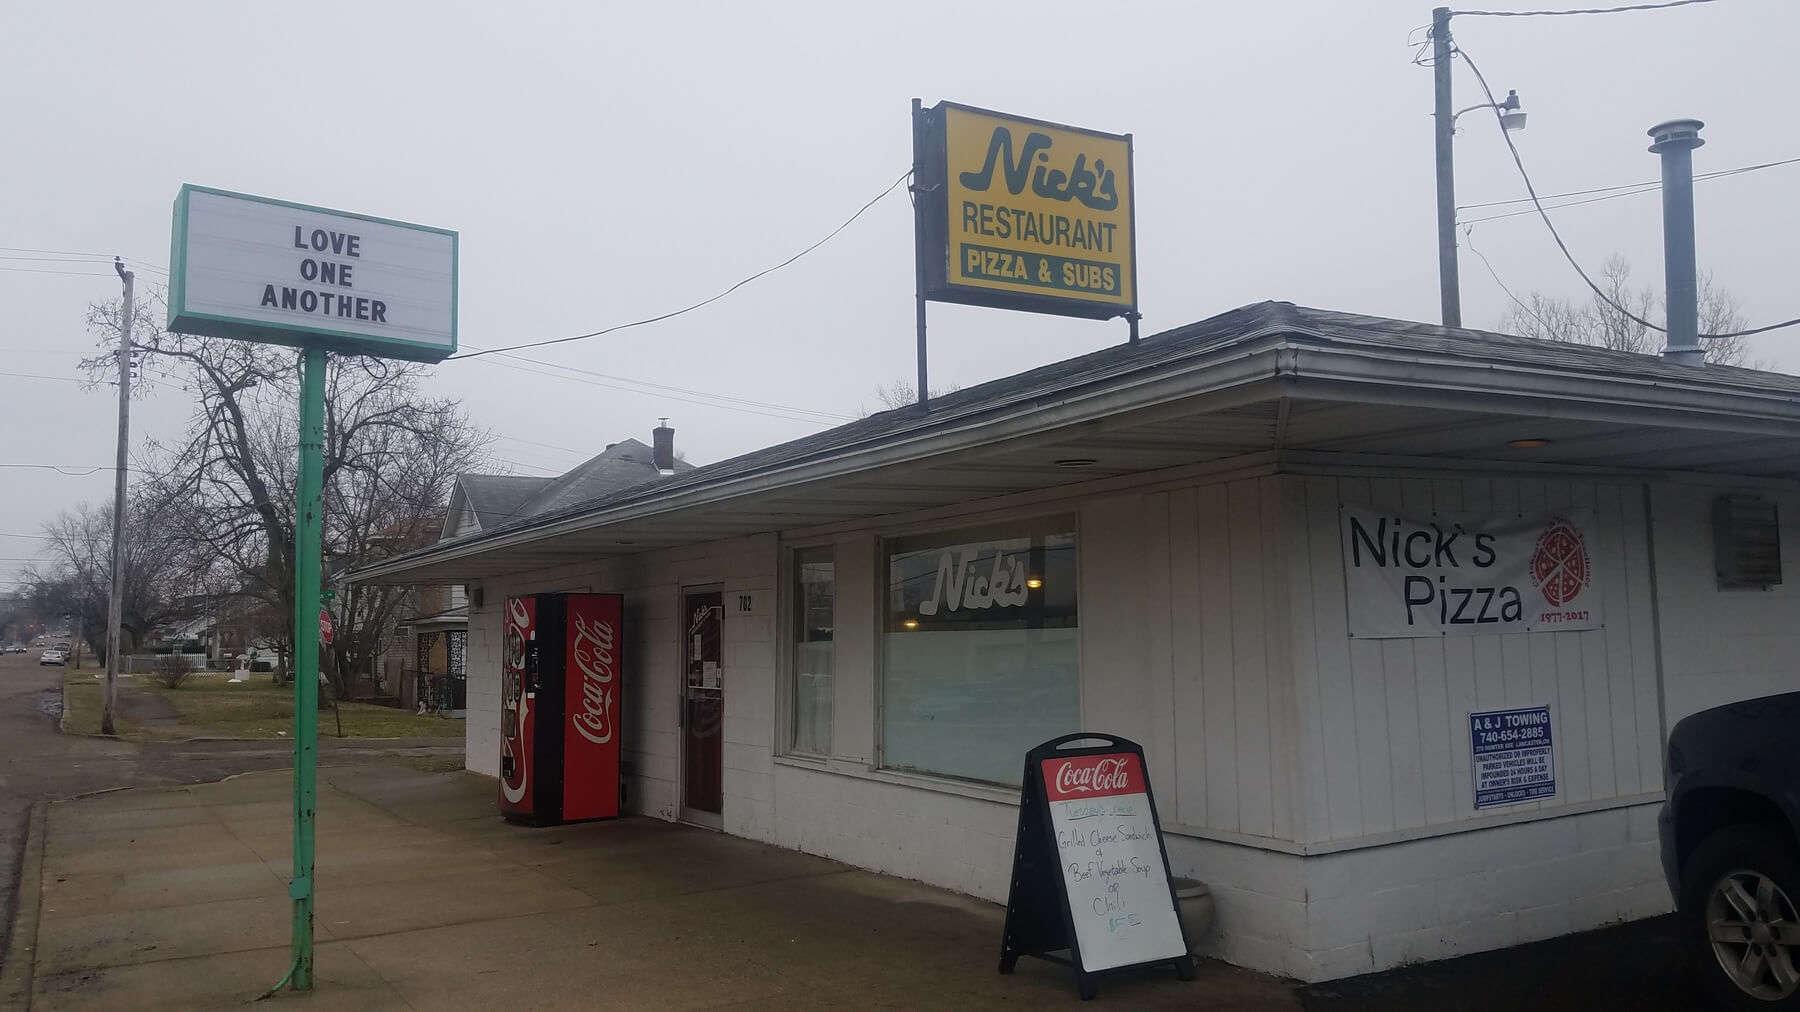 Nicks Restaurant and Pizza